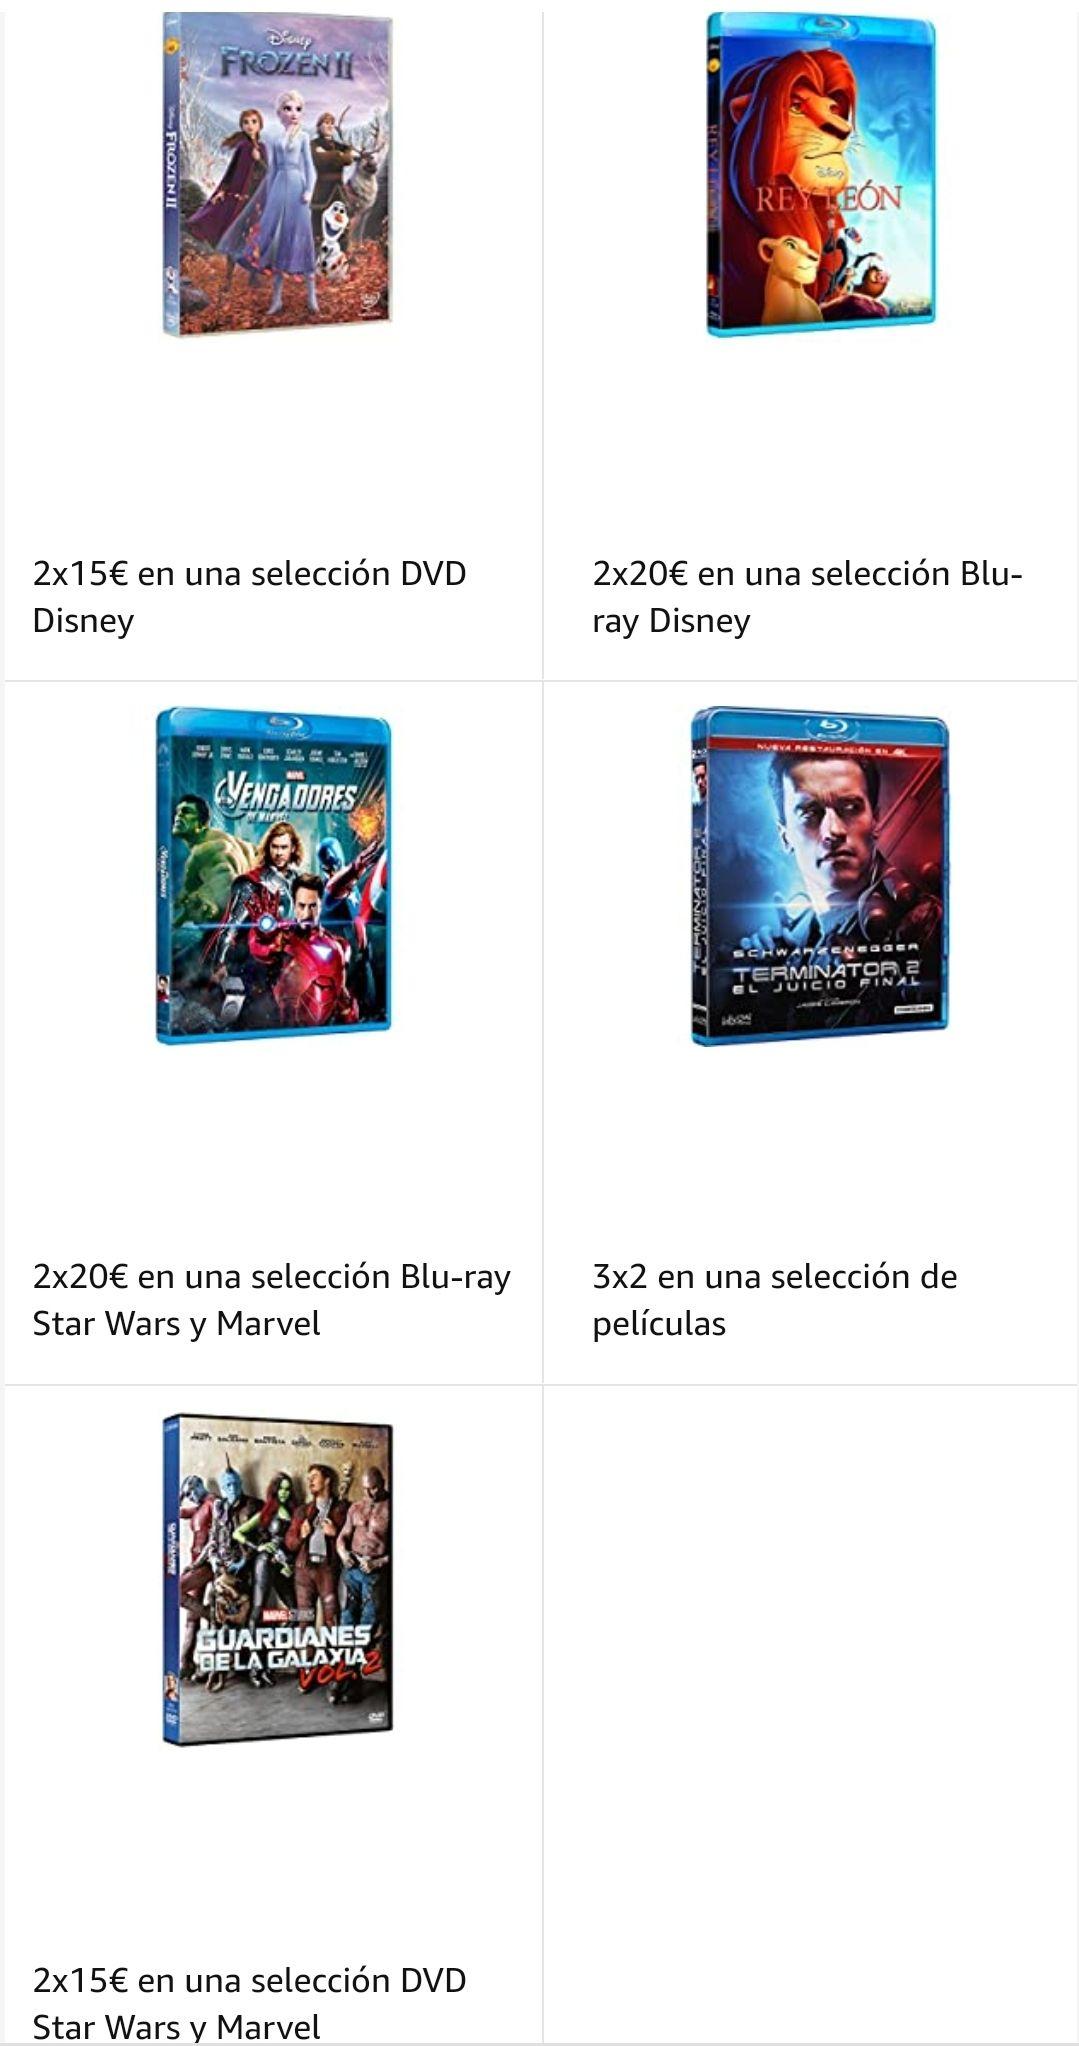 Ofertas 3x2 películas, 2x20€ Blu-ray, 2x15€ DVD en Amazon